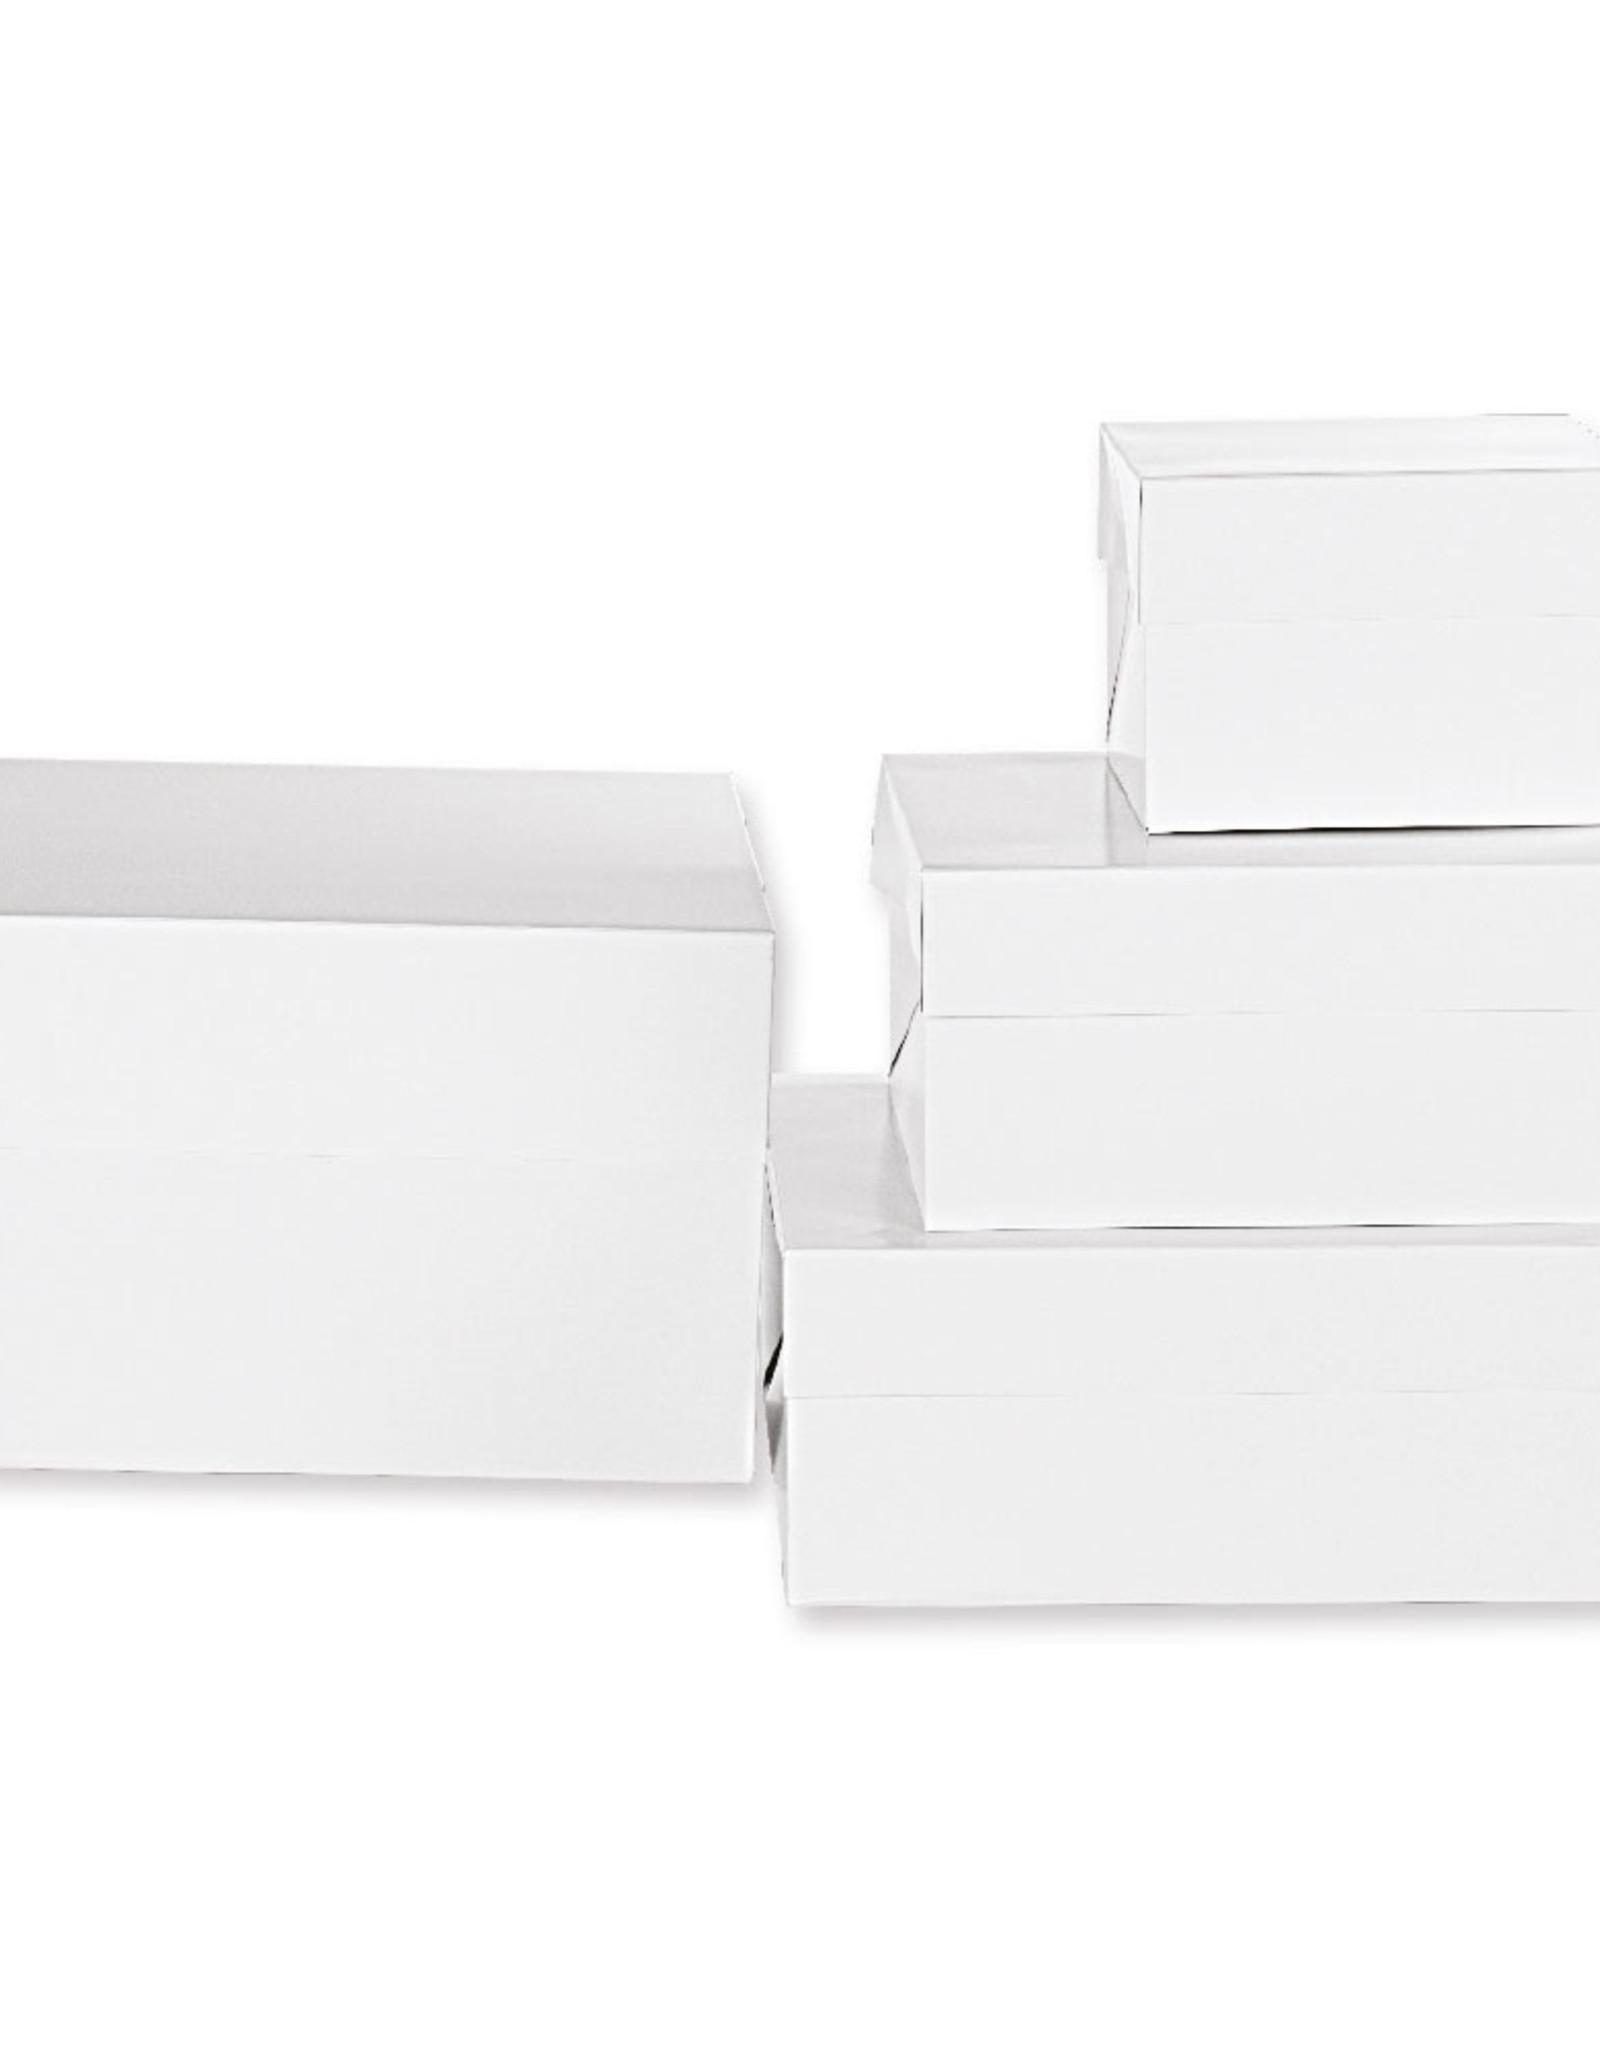 Decora Decora Taartdoos -Blanco 30x30x15cm- pk/1